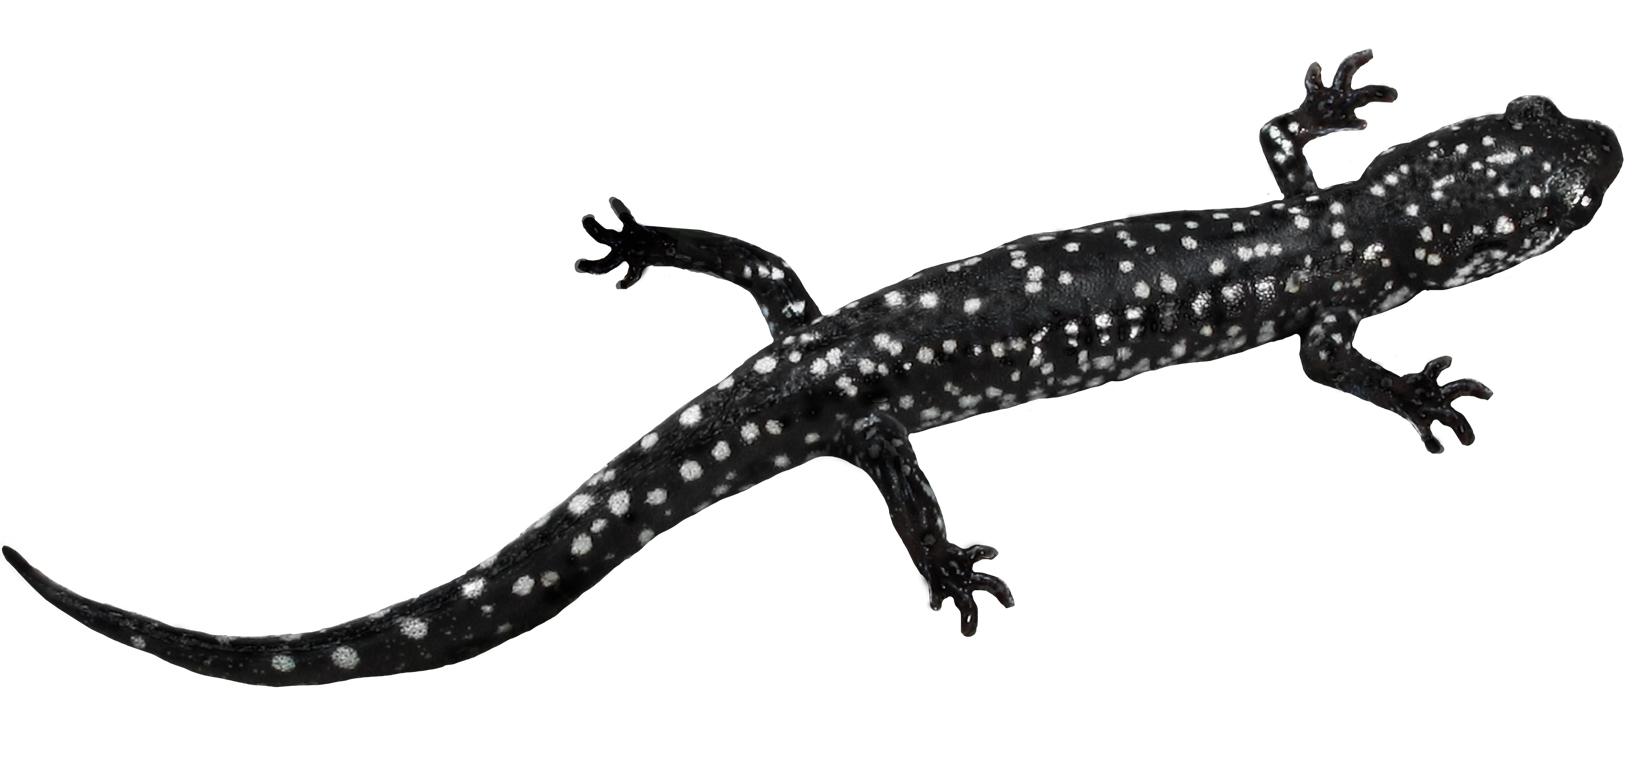 Ocmulgee Slimy Salamander